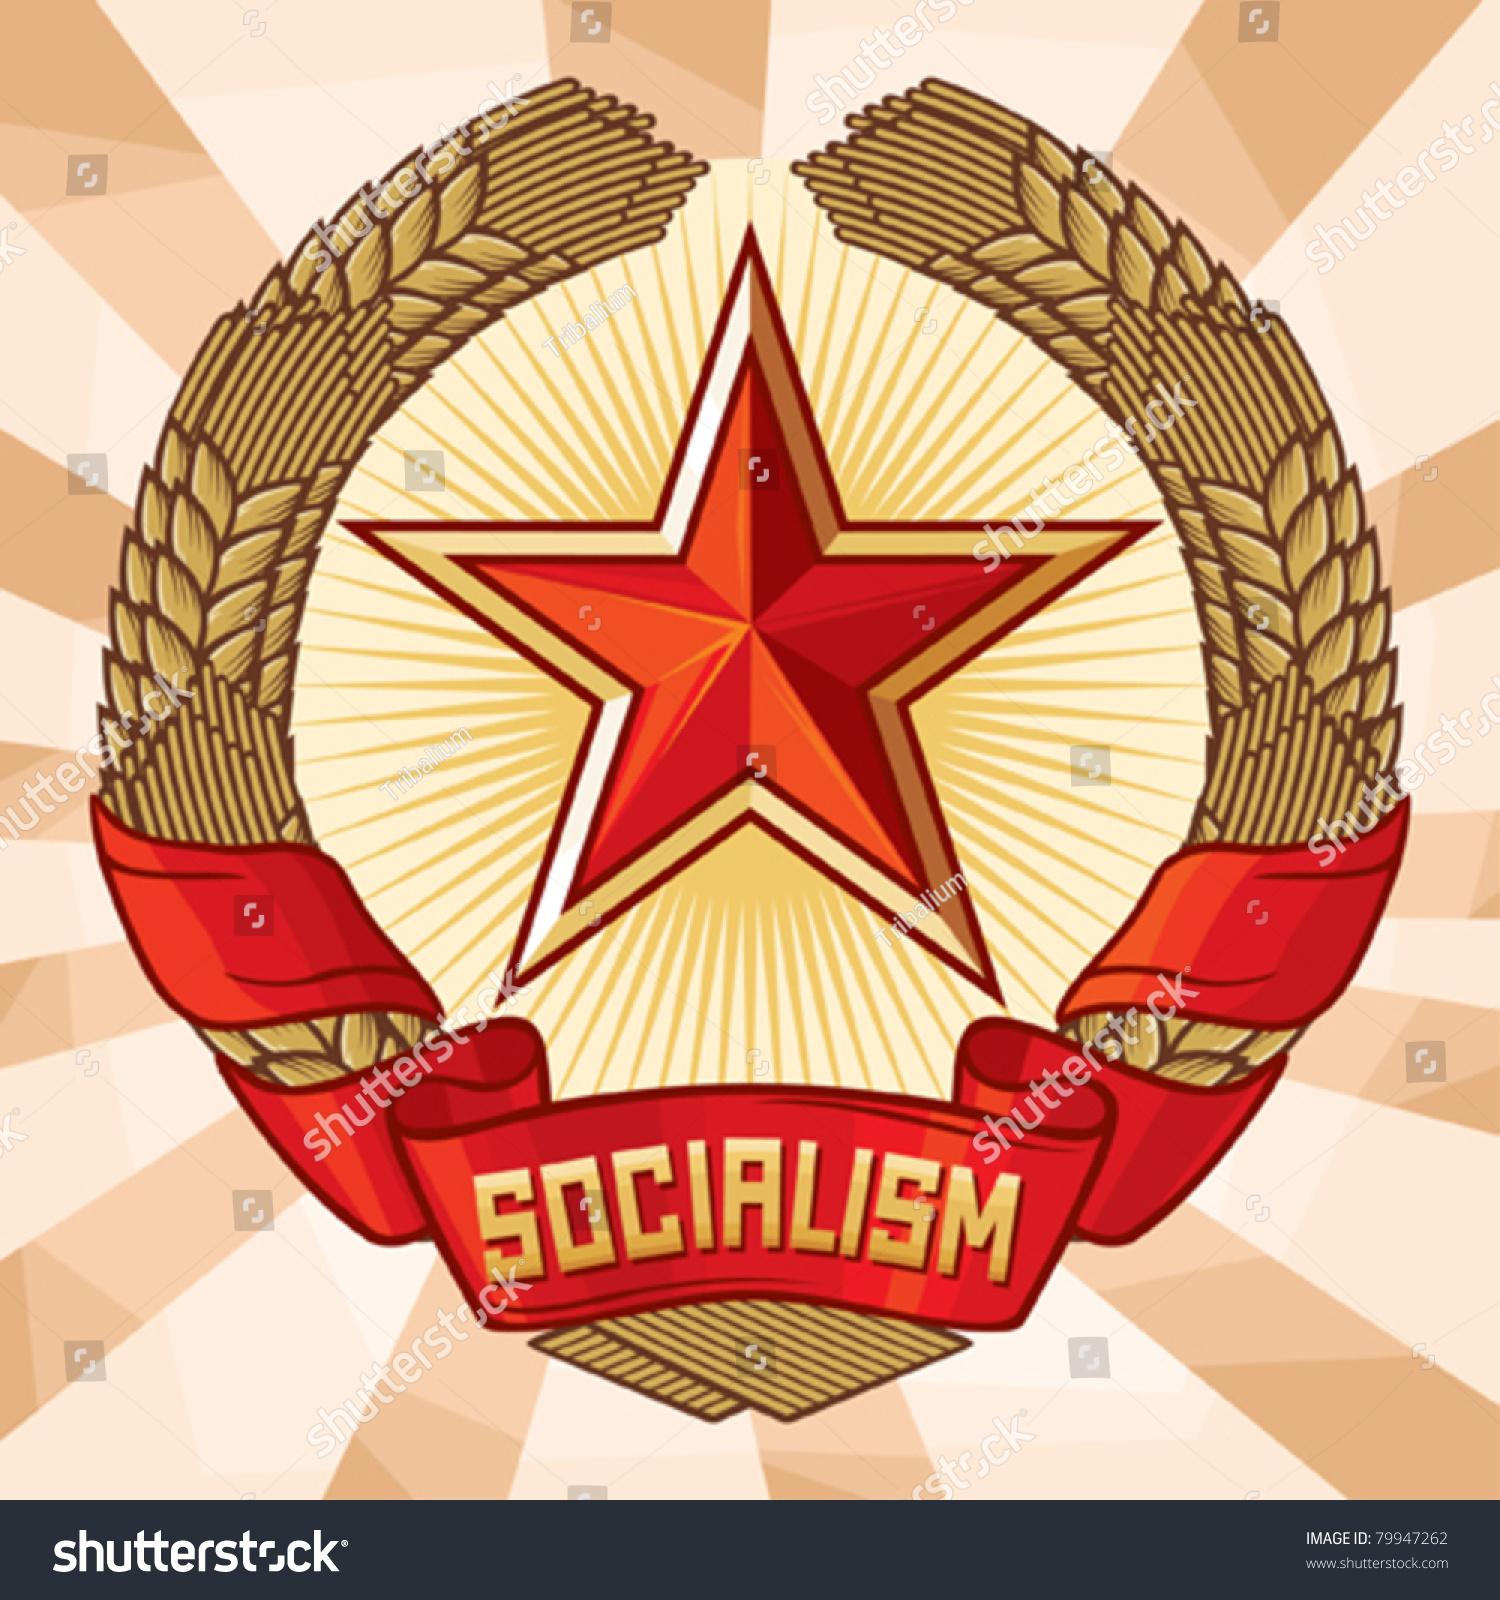 Socialism emblem a symbol communism wreath stock vector 79947262 socialism emblem a symbol of communism wreath of wheat and star biocorpaavc Gallery